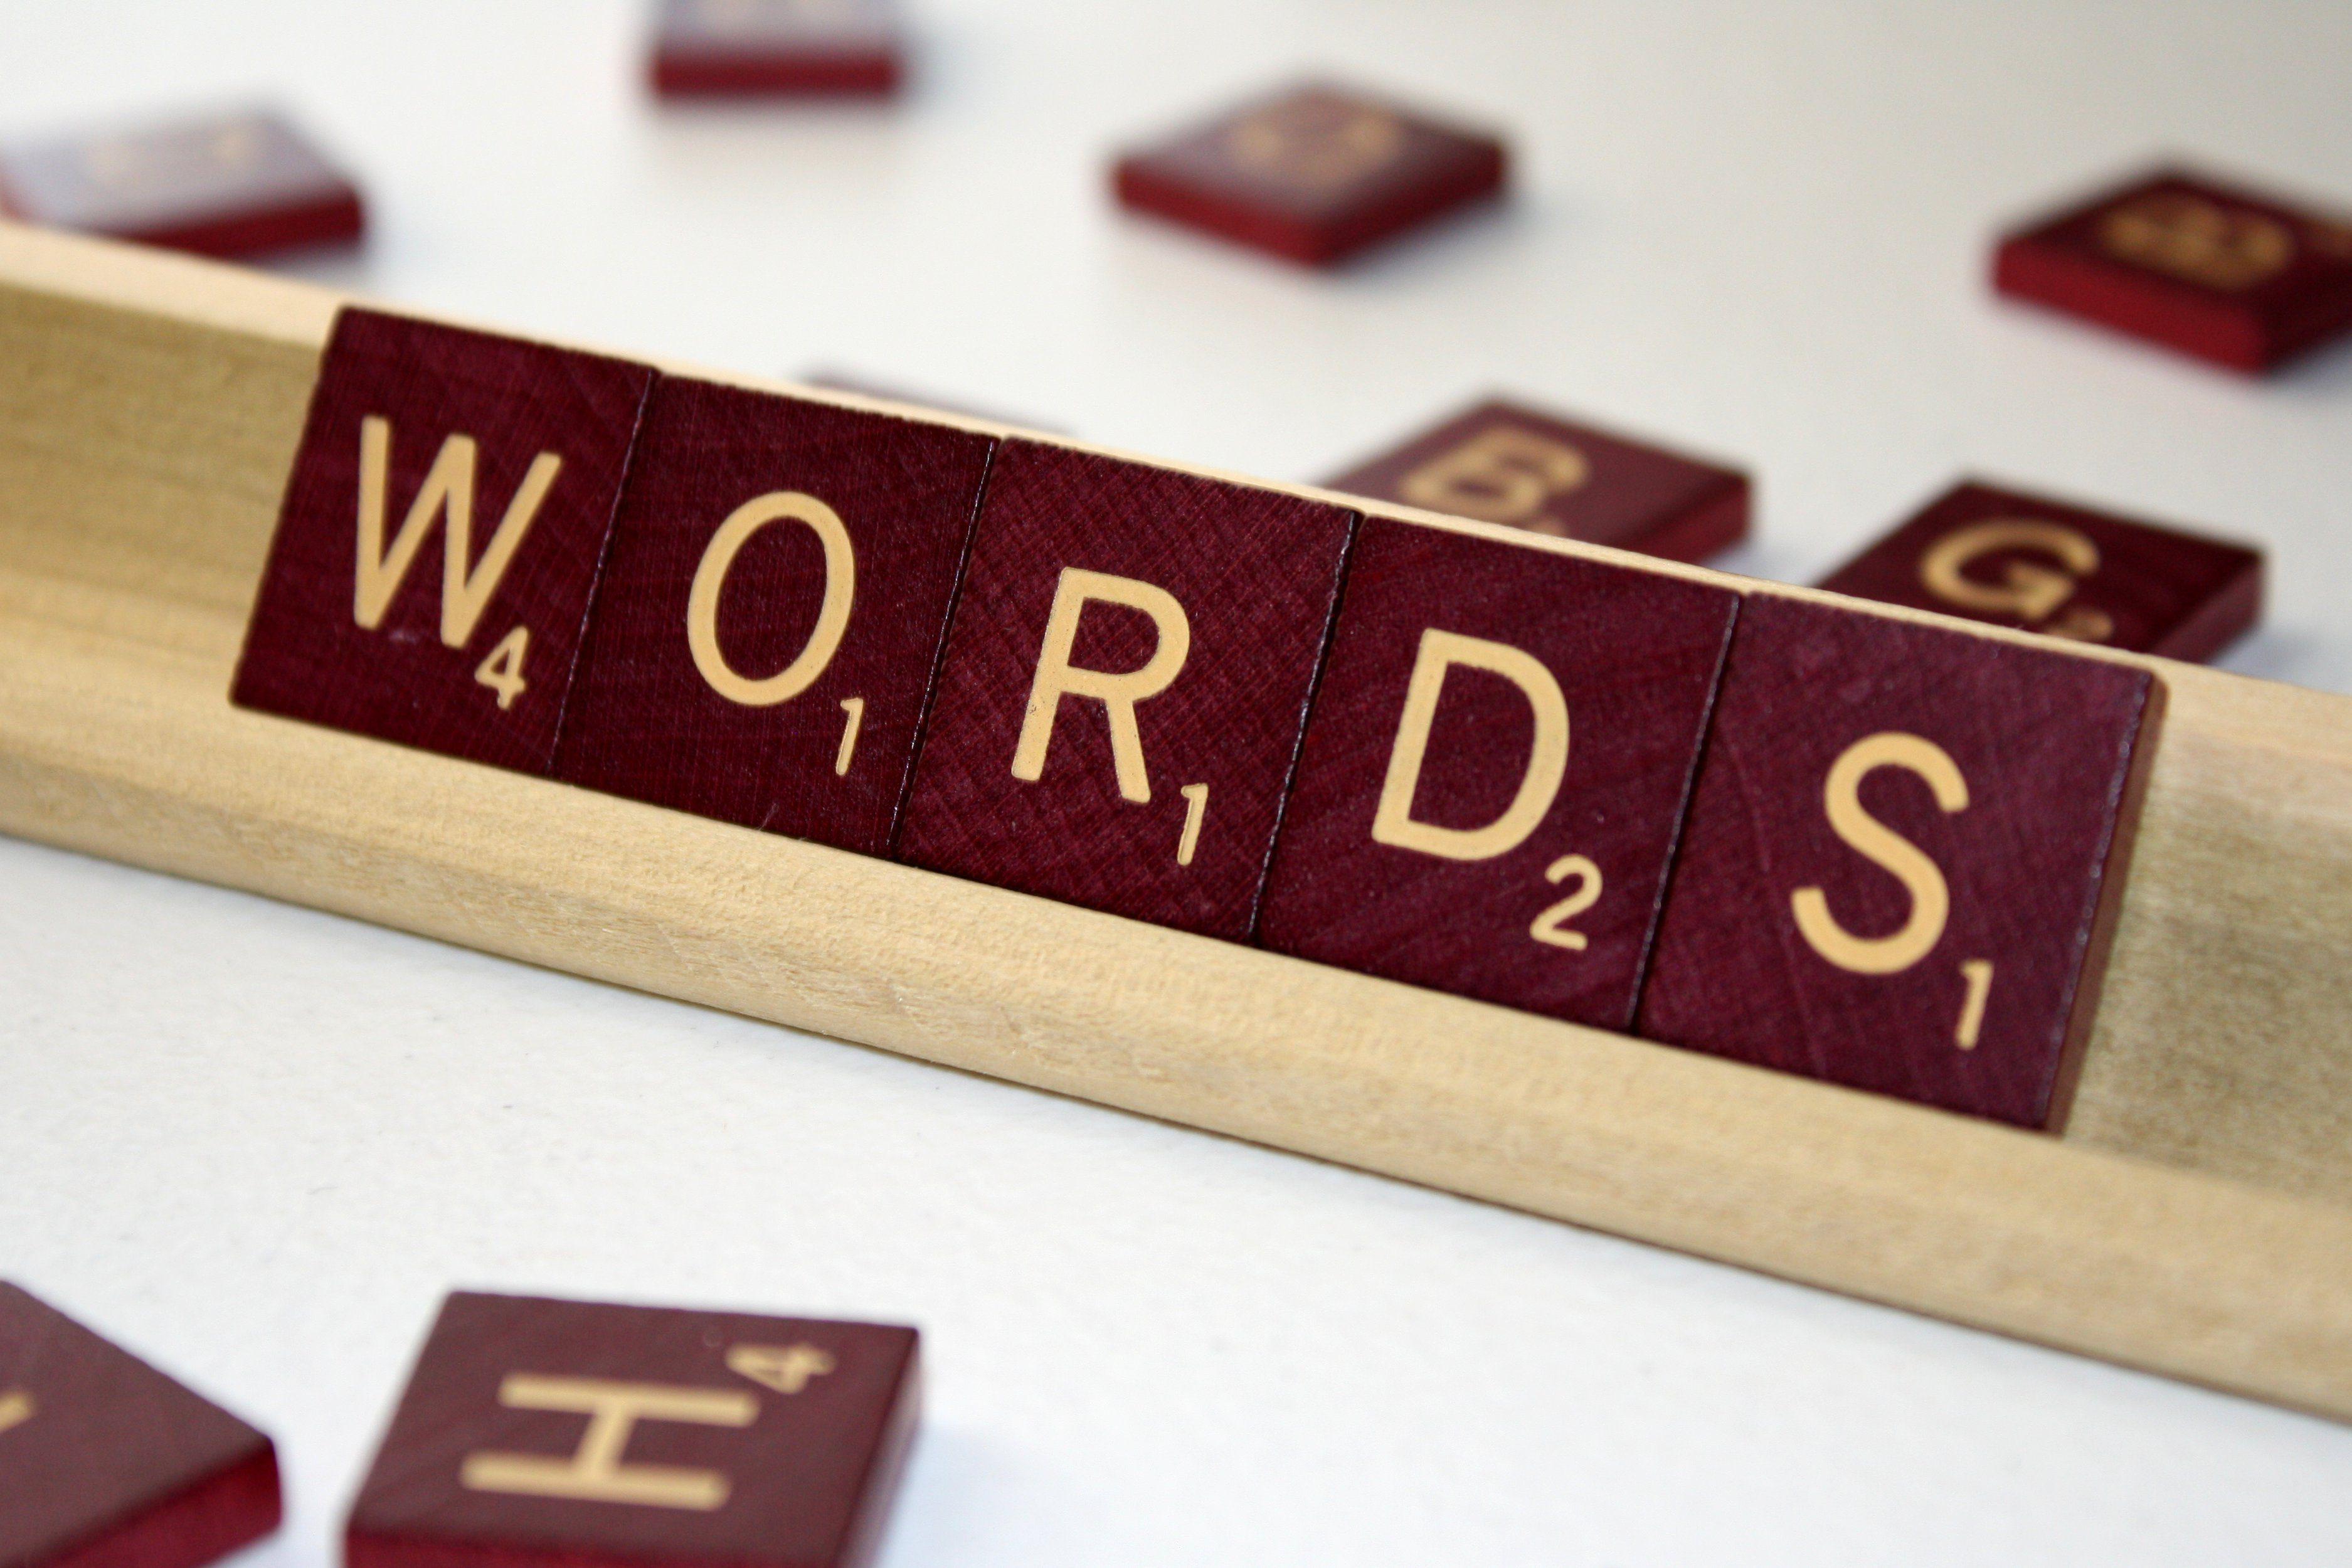 8 must avoid words